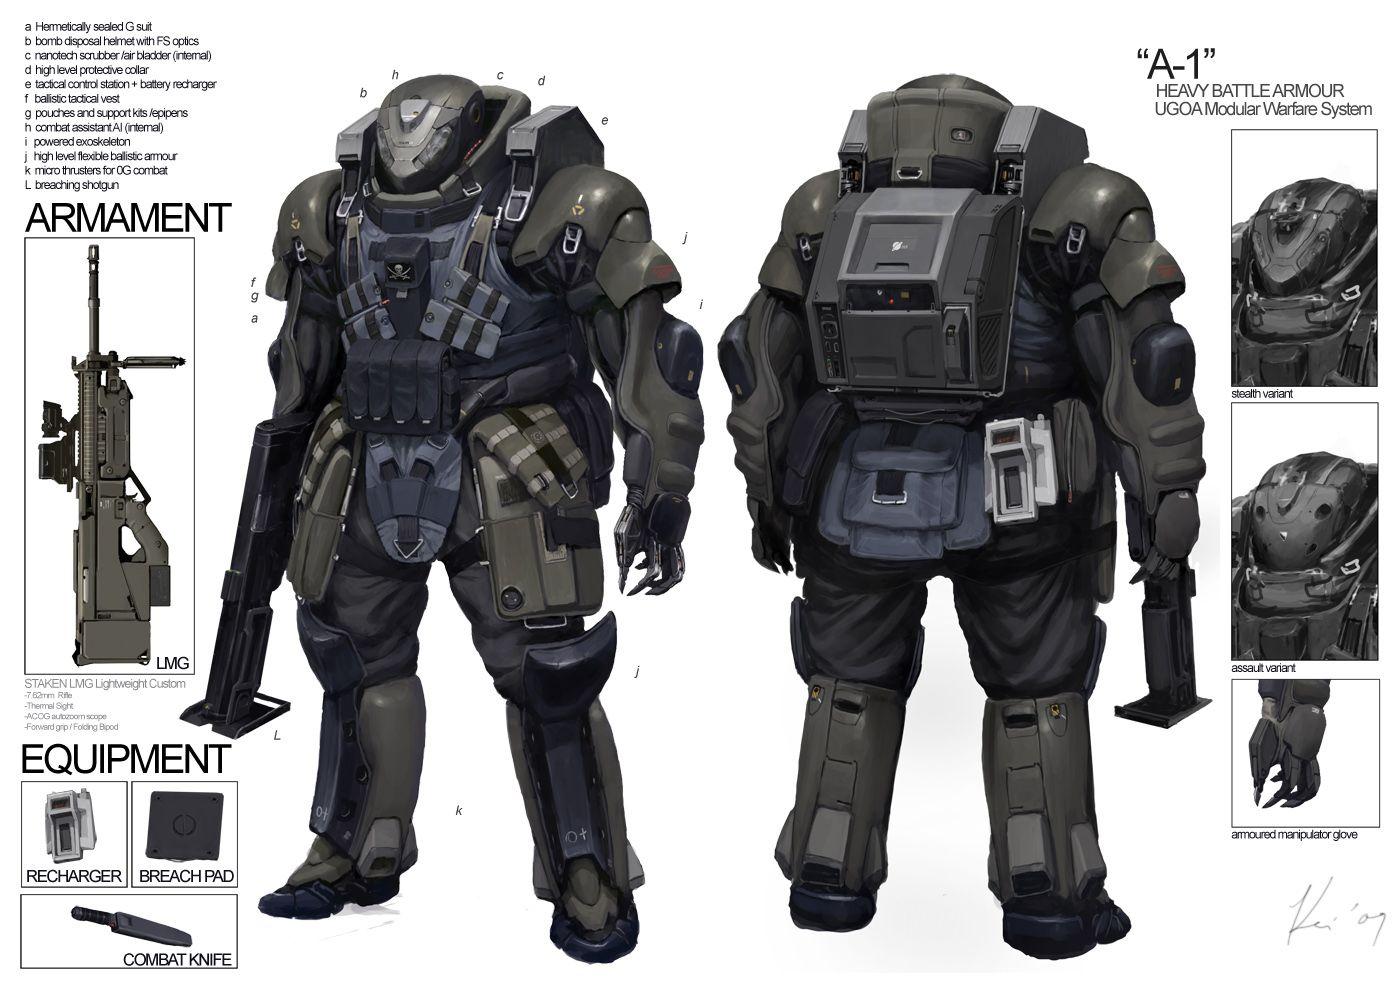 Space Vagabonds: Assaulter by ukitakumuki.deviantart.com on @deviantART